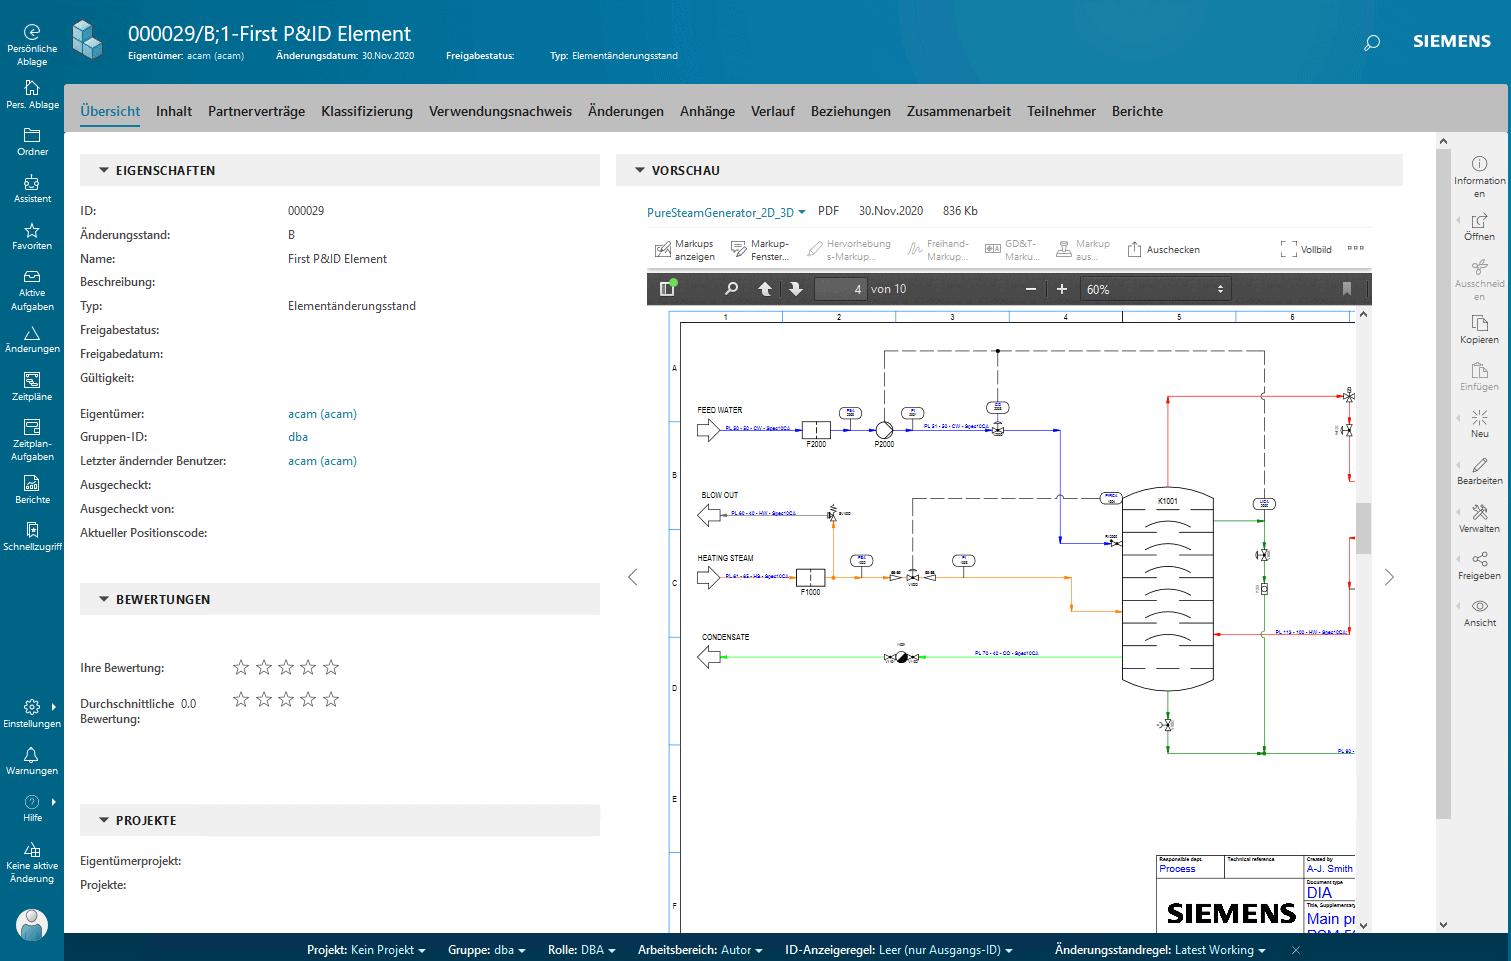 P&ID - Teamcenter Integration